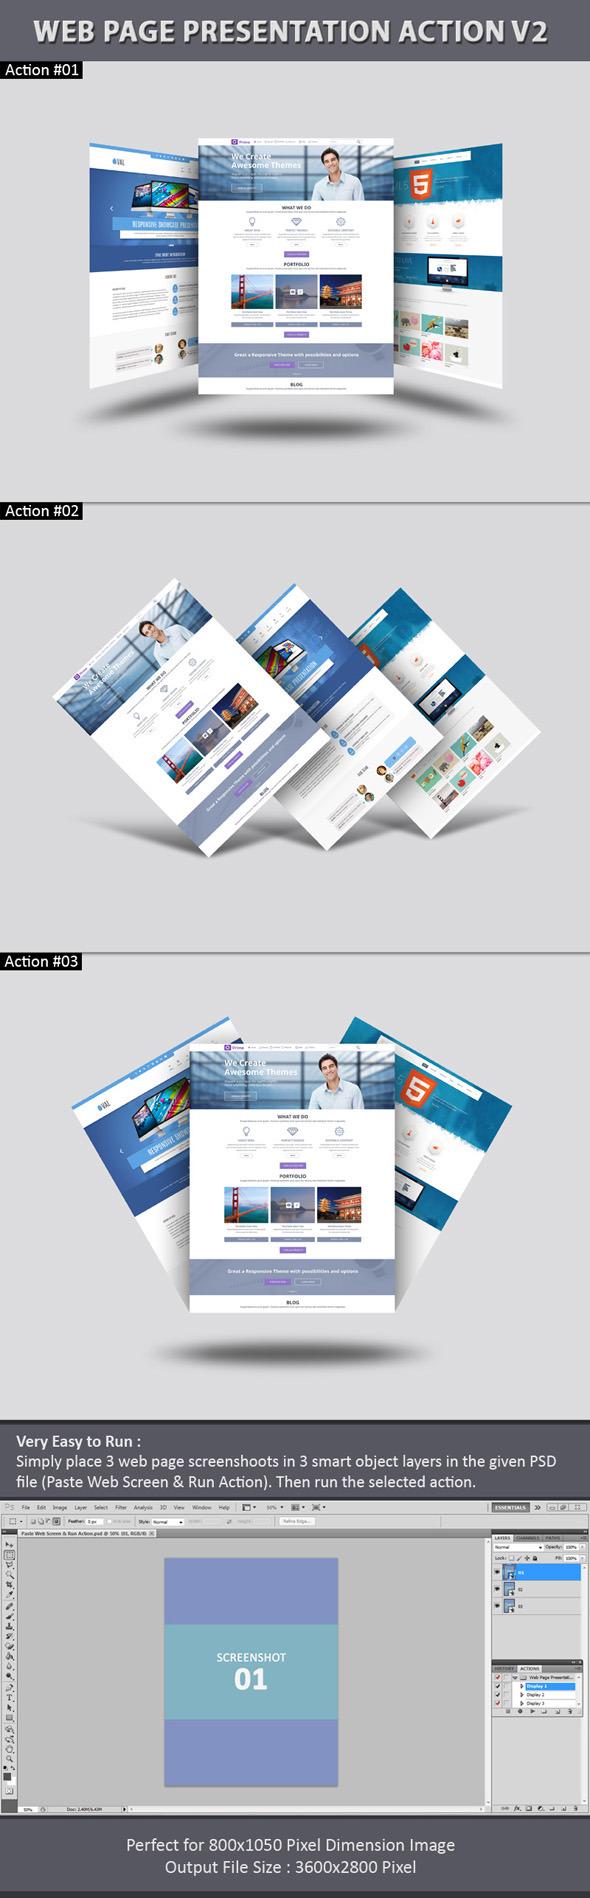 Web Page Presentation Action V2